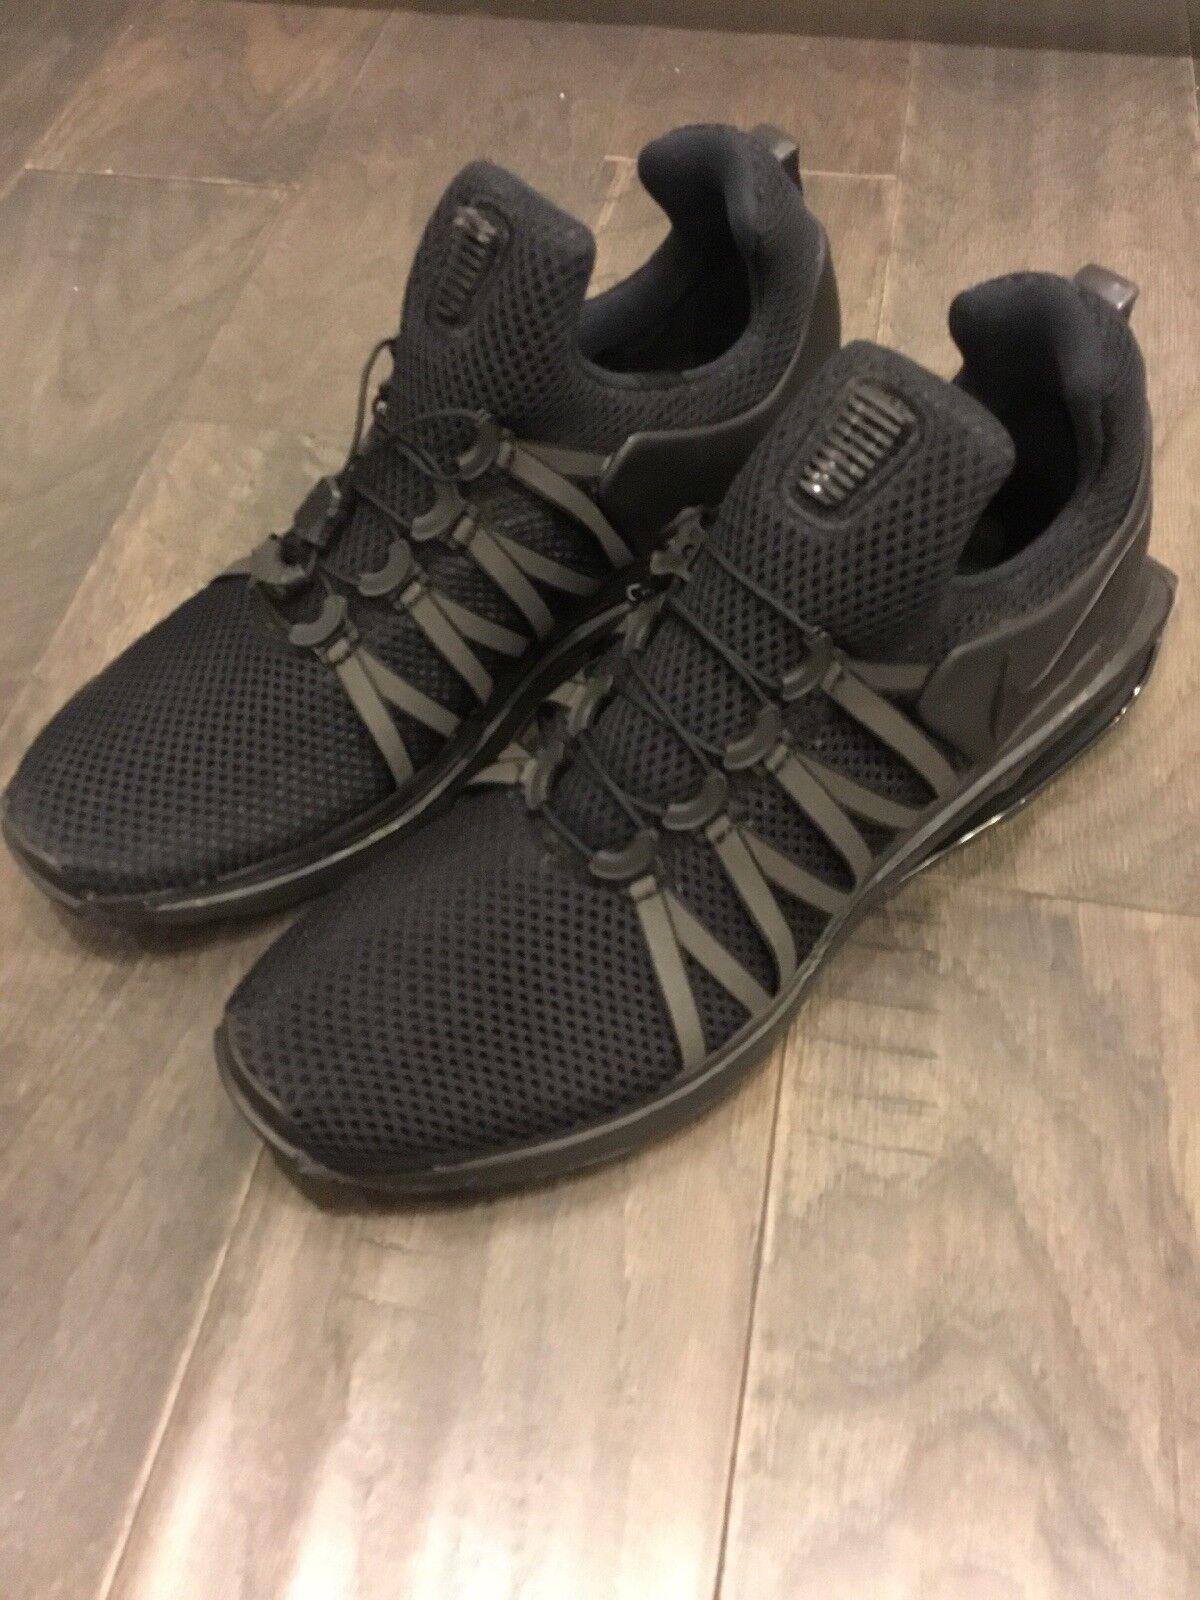 Nike Shod Gravity AR1999 001 New shoes Sneers Shox Black Black Black Size 9 c6befa